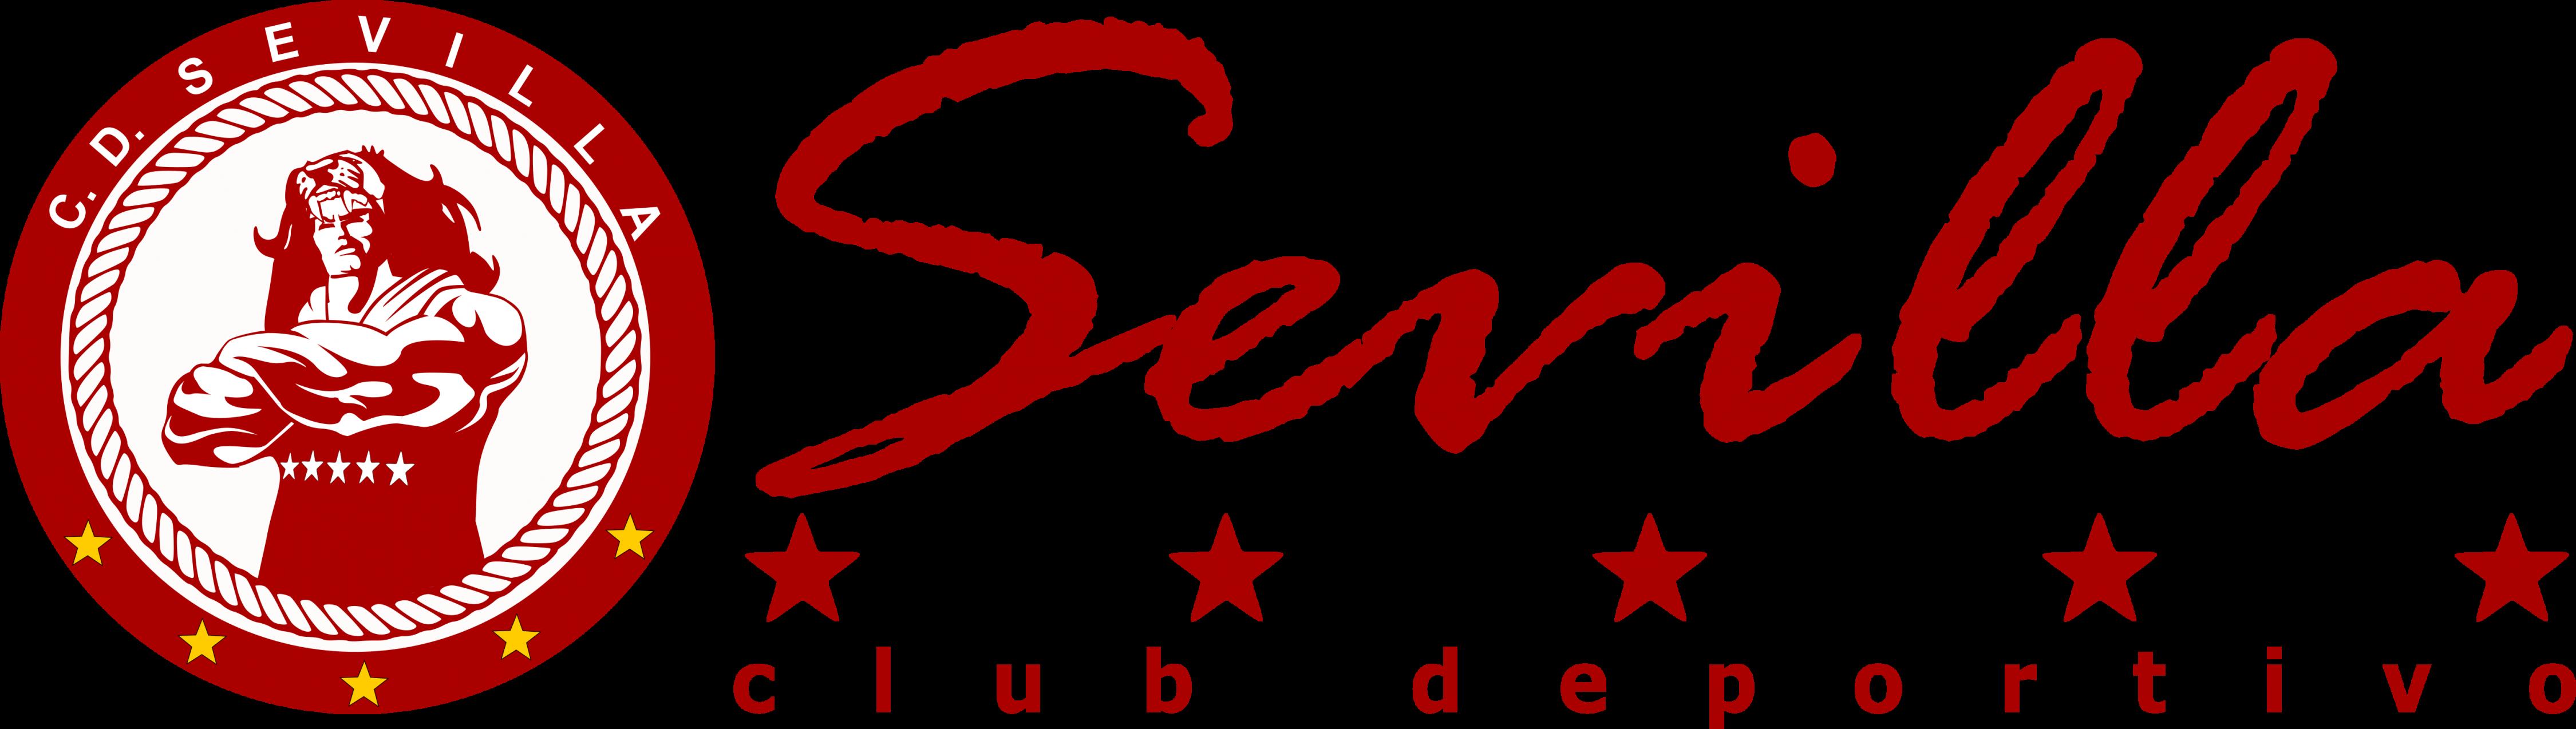 Sevilla 5 estrellas logo